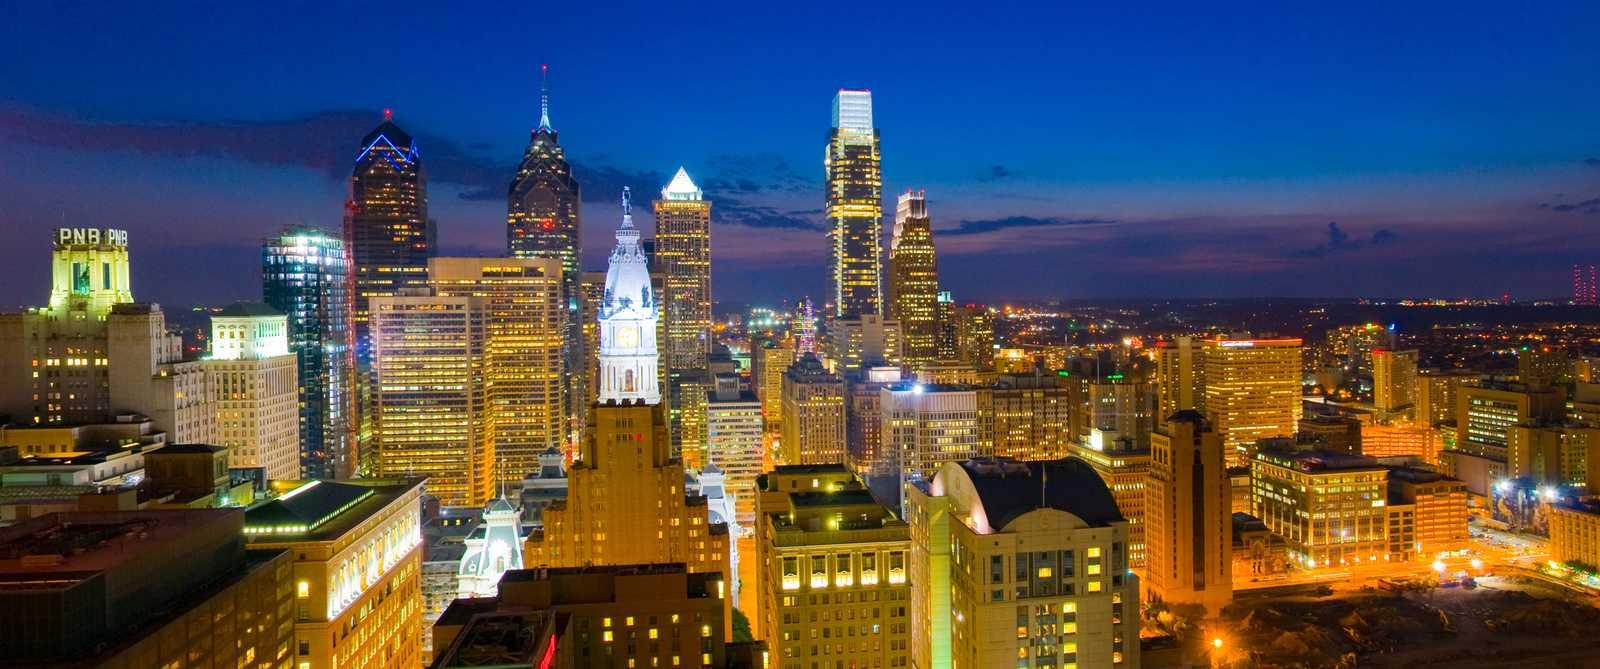 Die Skyline Philadelphias bei Nacht